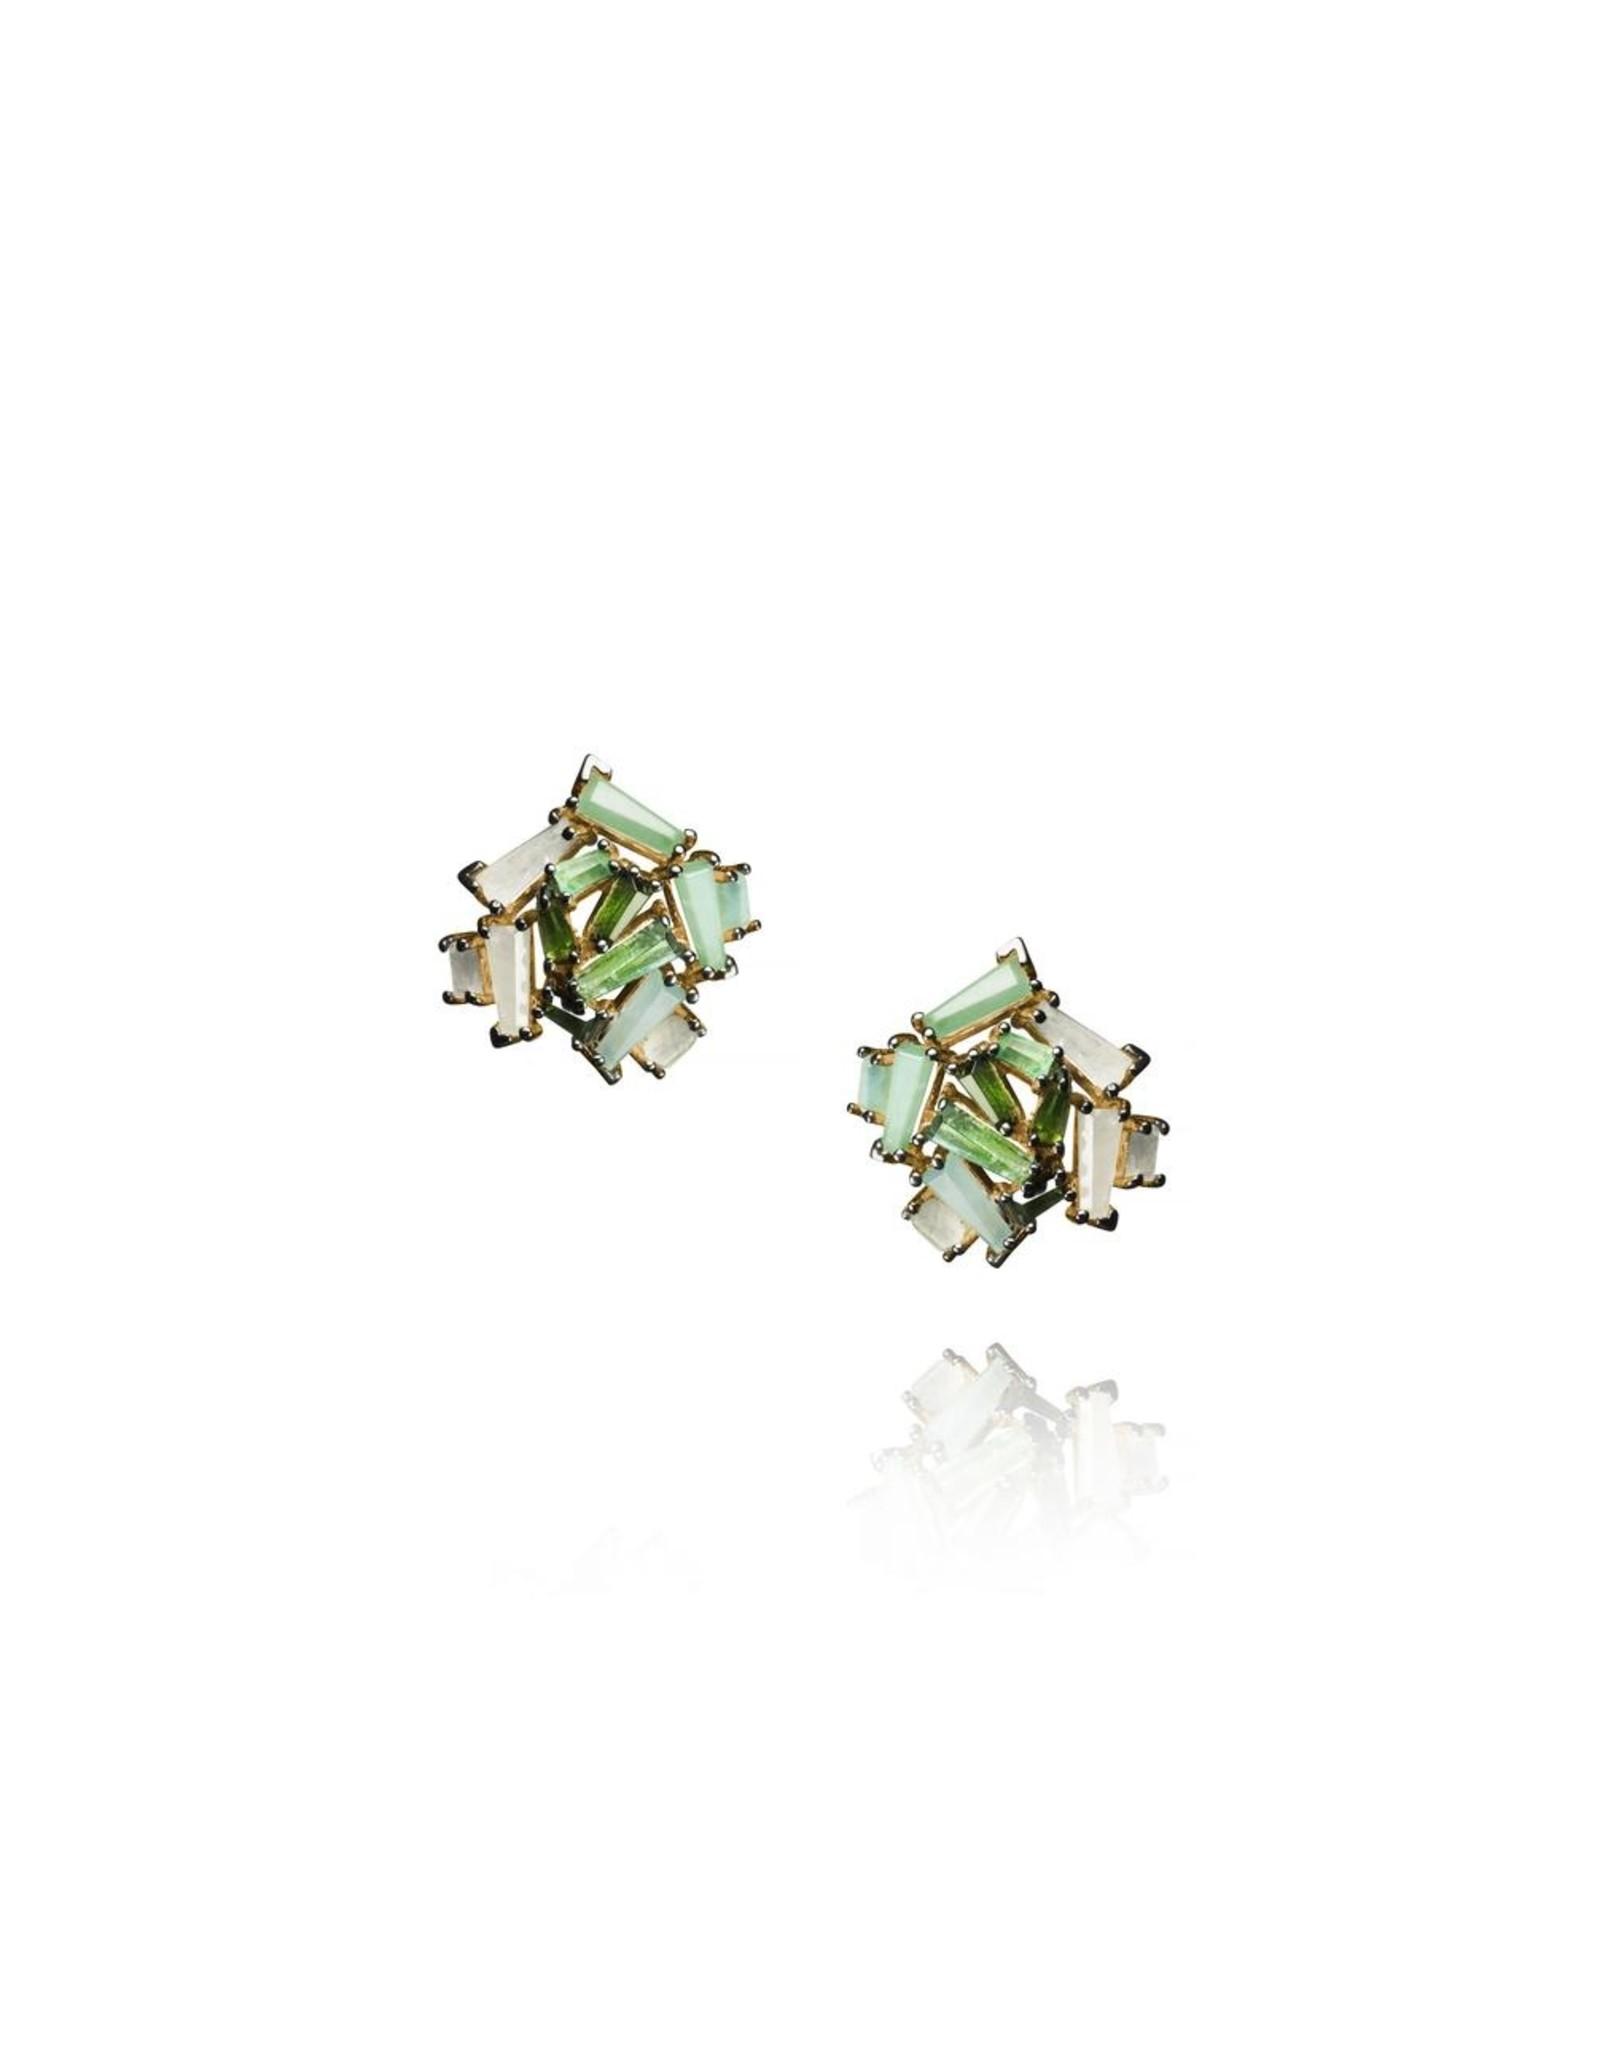 Nak Armstrong Nak Armstrong Petite Rose Stud Earrings (Color: emerald, blue Peruvian opal, green tourmaline, opaque white sapphire)